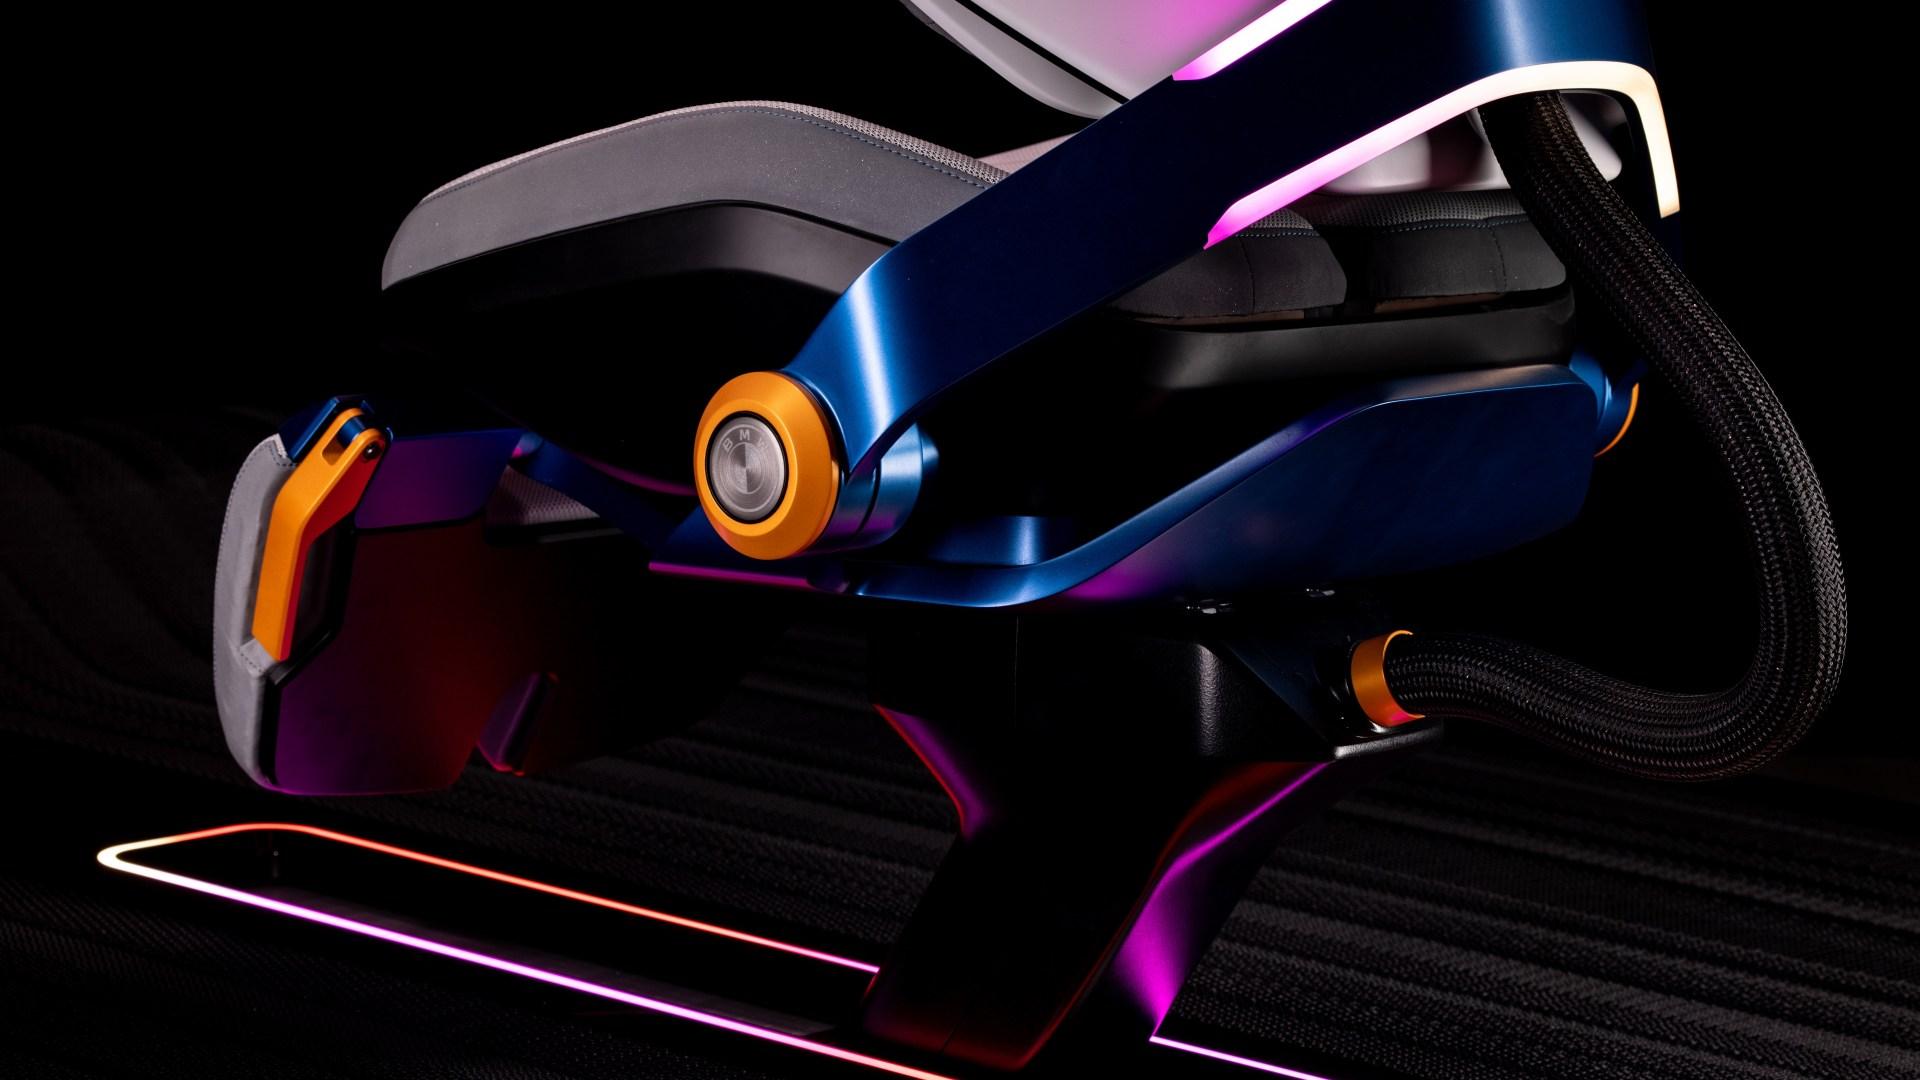 Detail shot of gaming chair.